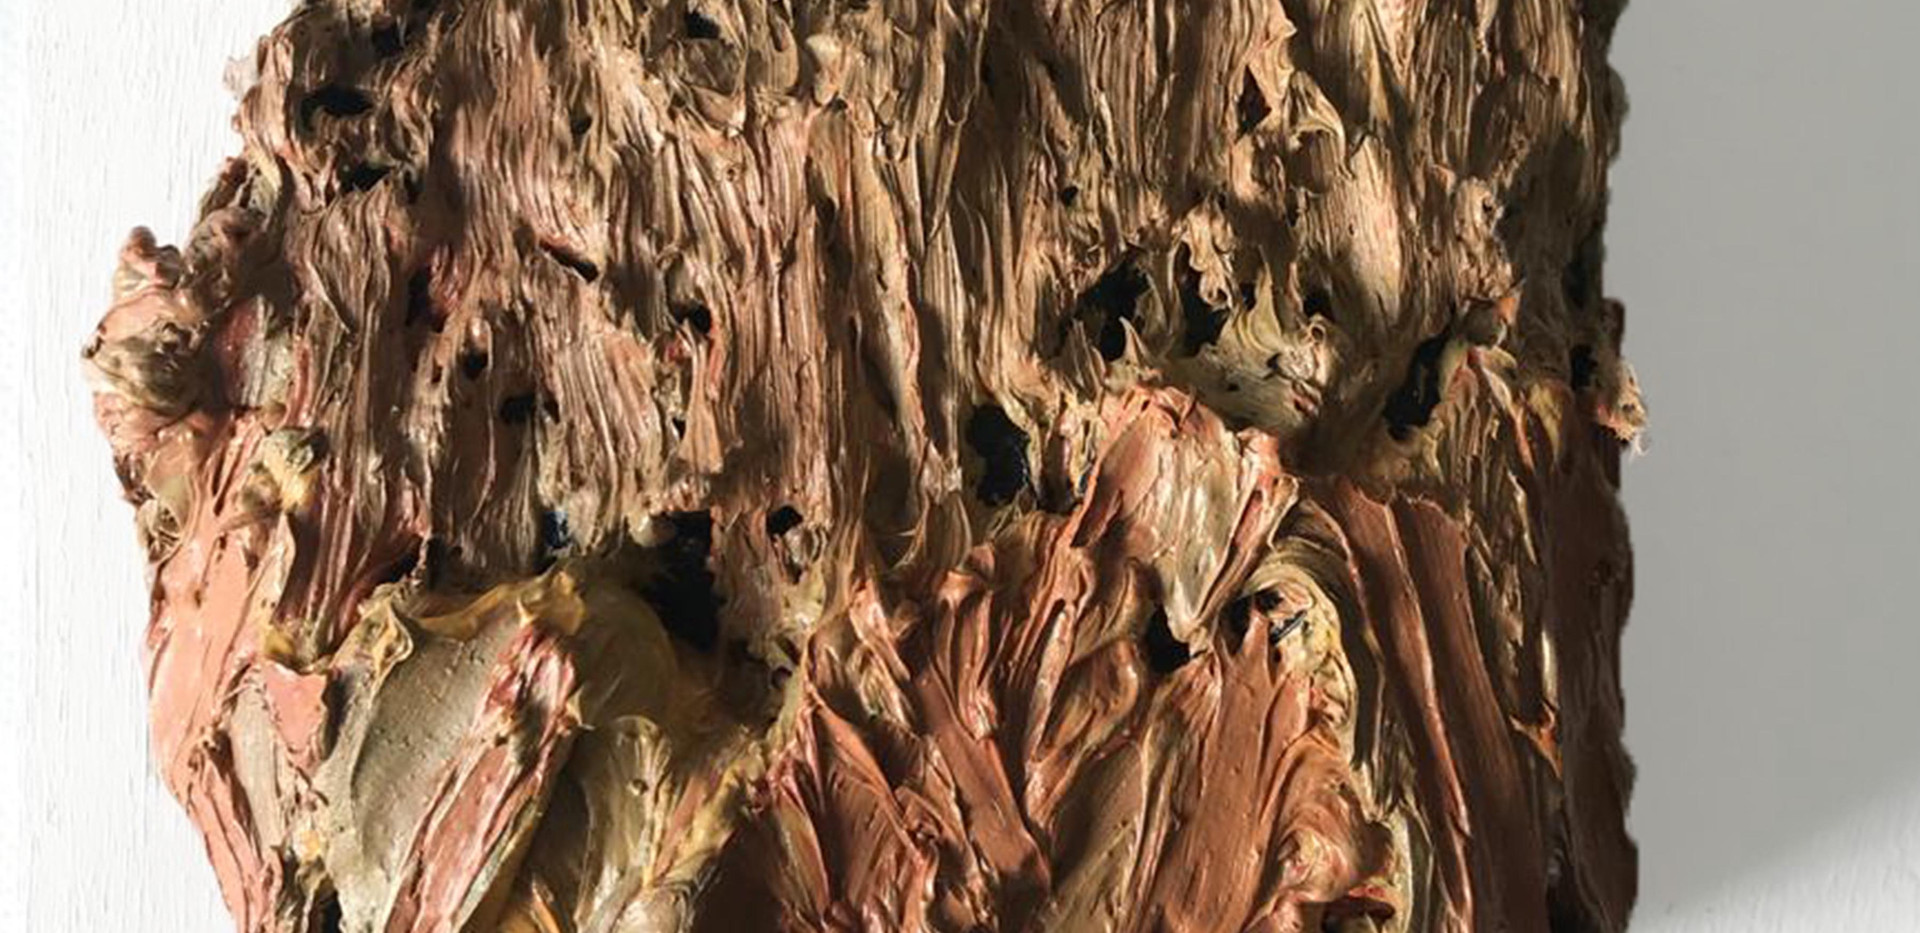 Untitled Brown